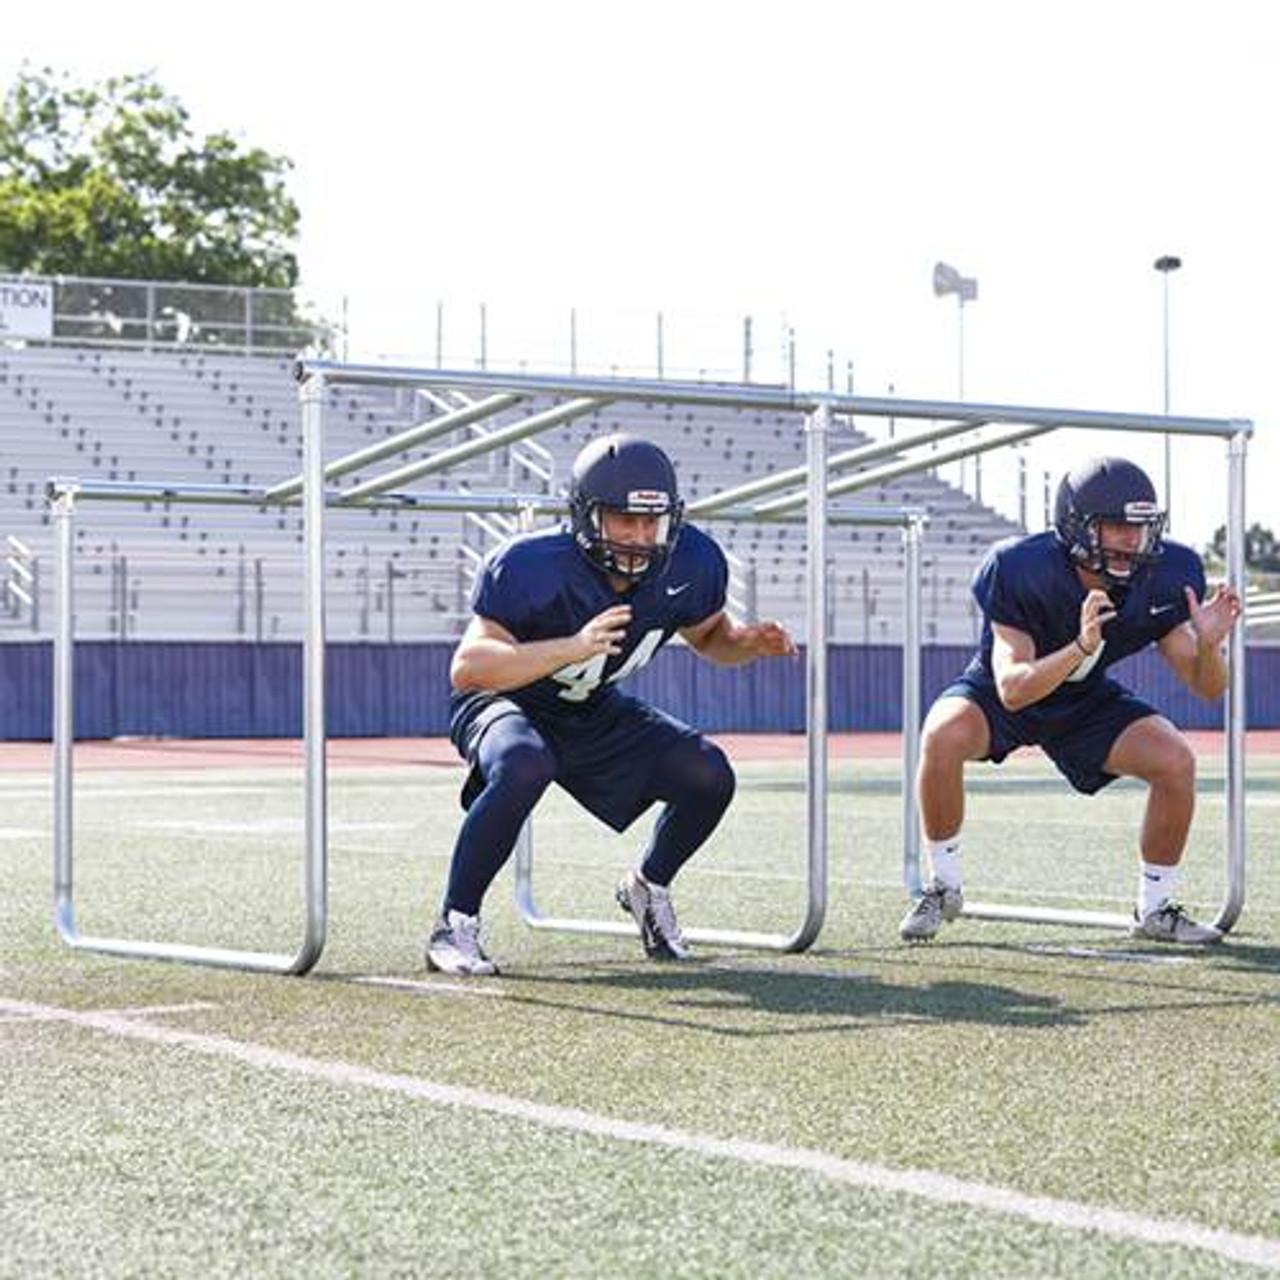 Pro-Down Collegiate Lineman Chute for football